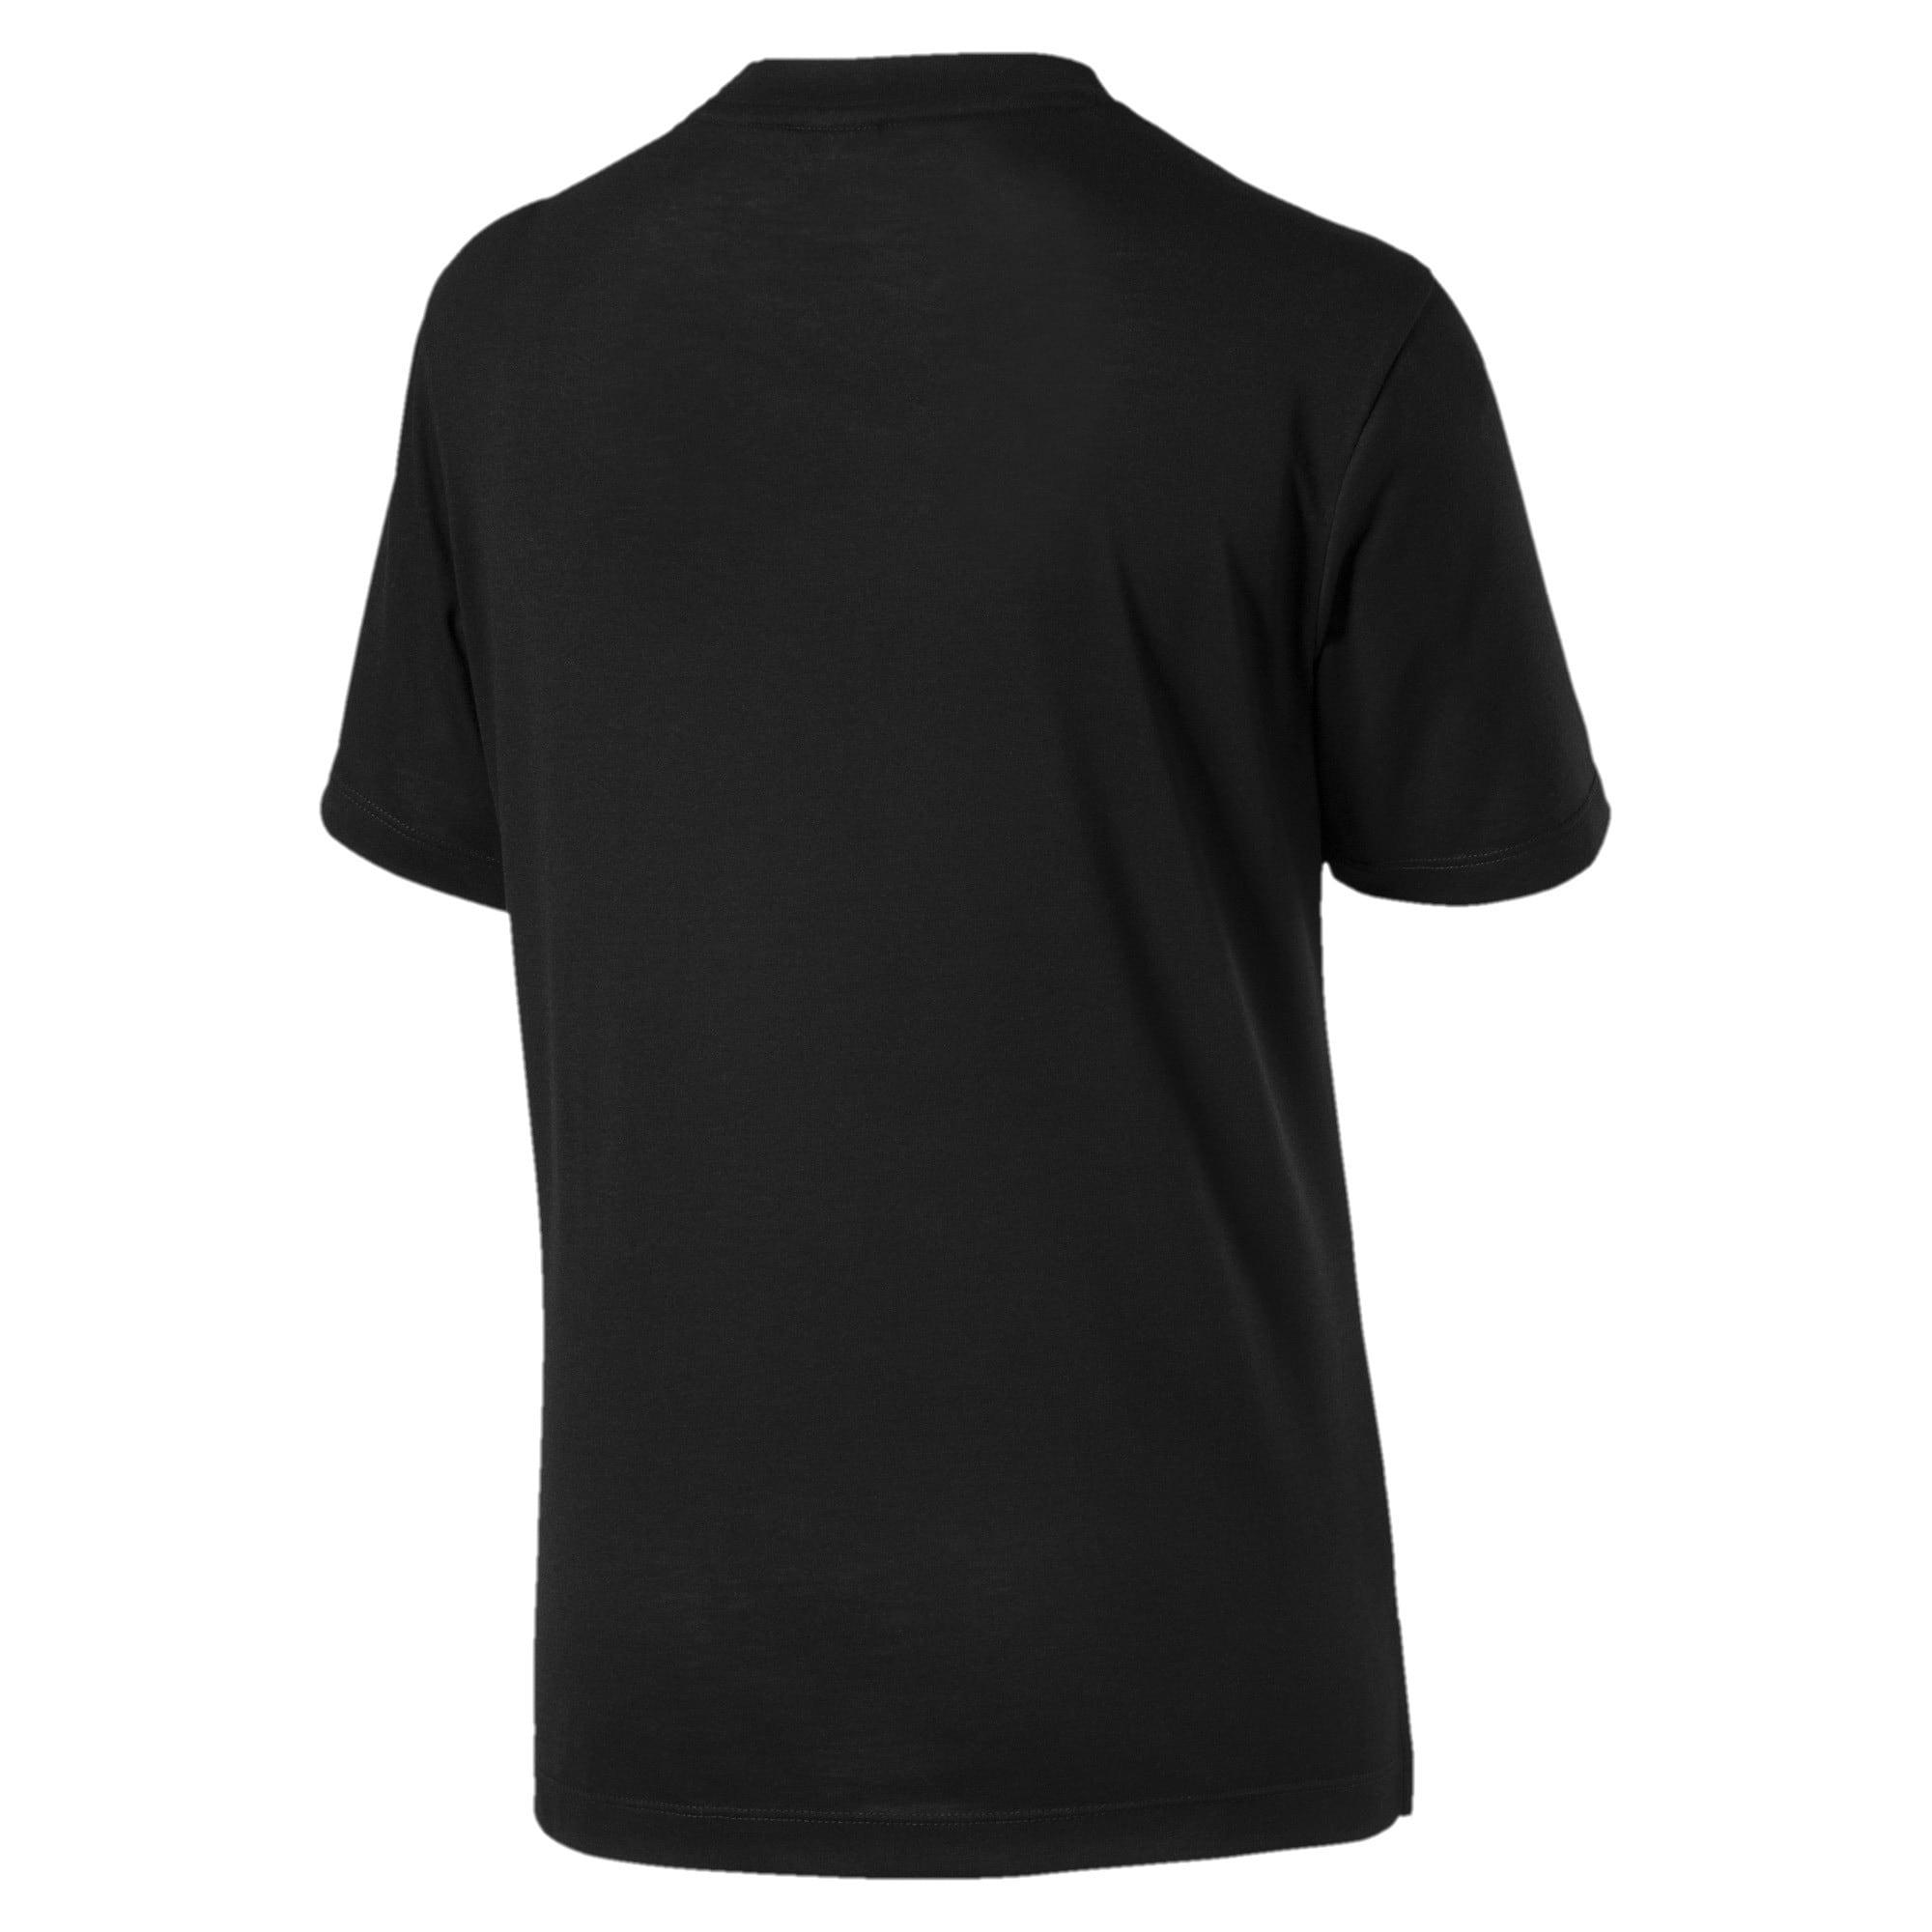 Thumbnail 2 of Classics Logo Women's Short Sleeve T-Shirt, Puma Black-2, medium-IND